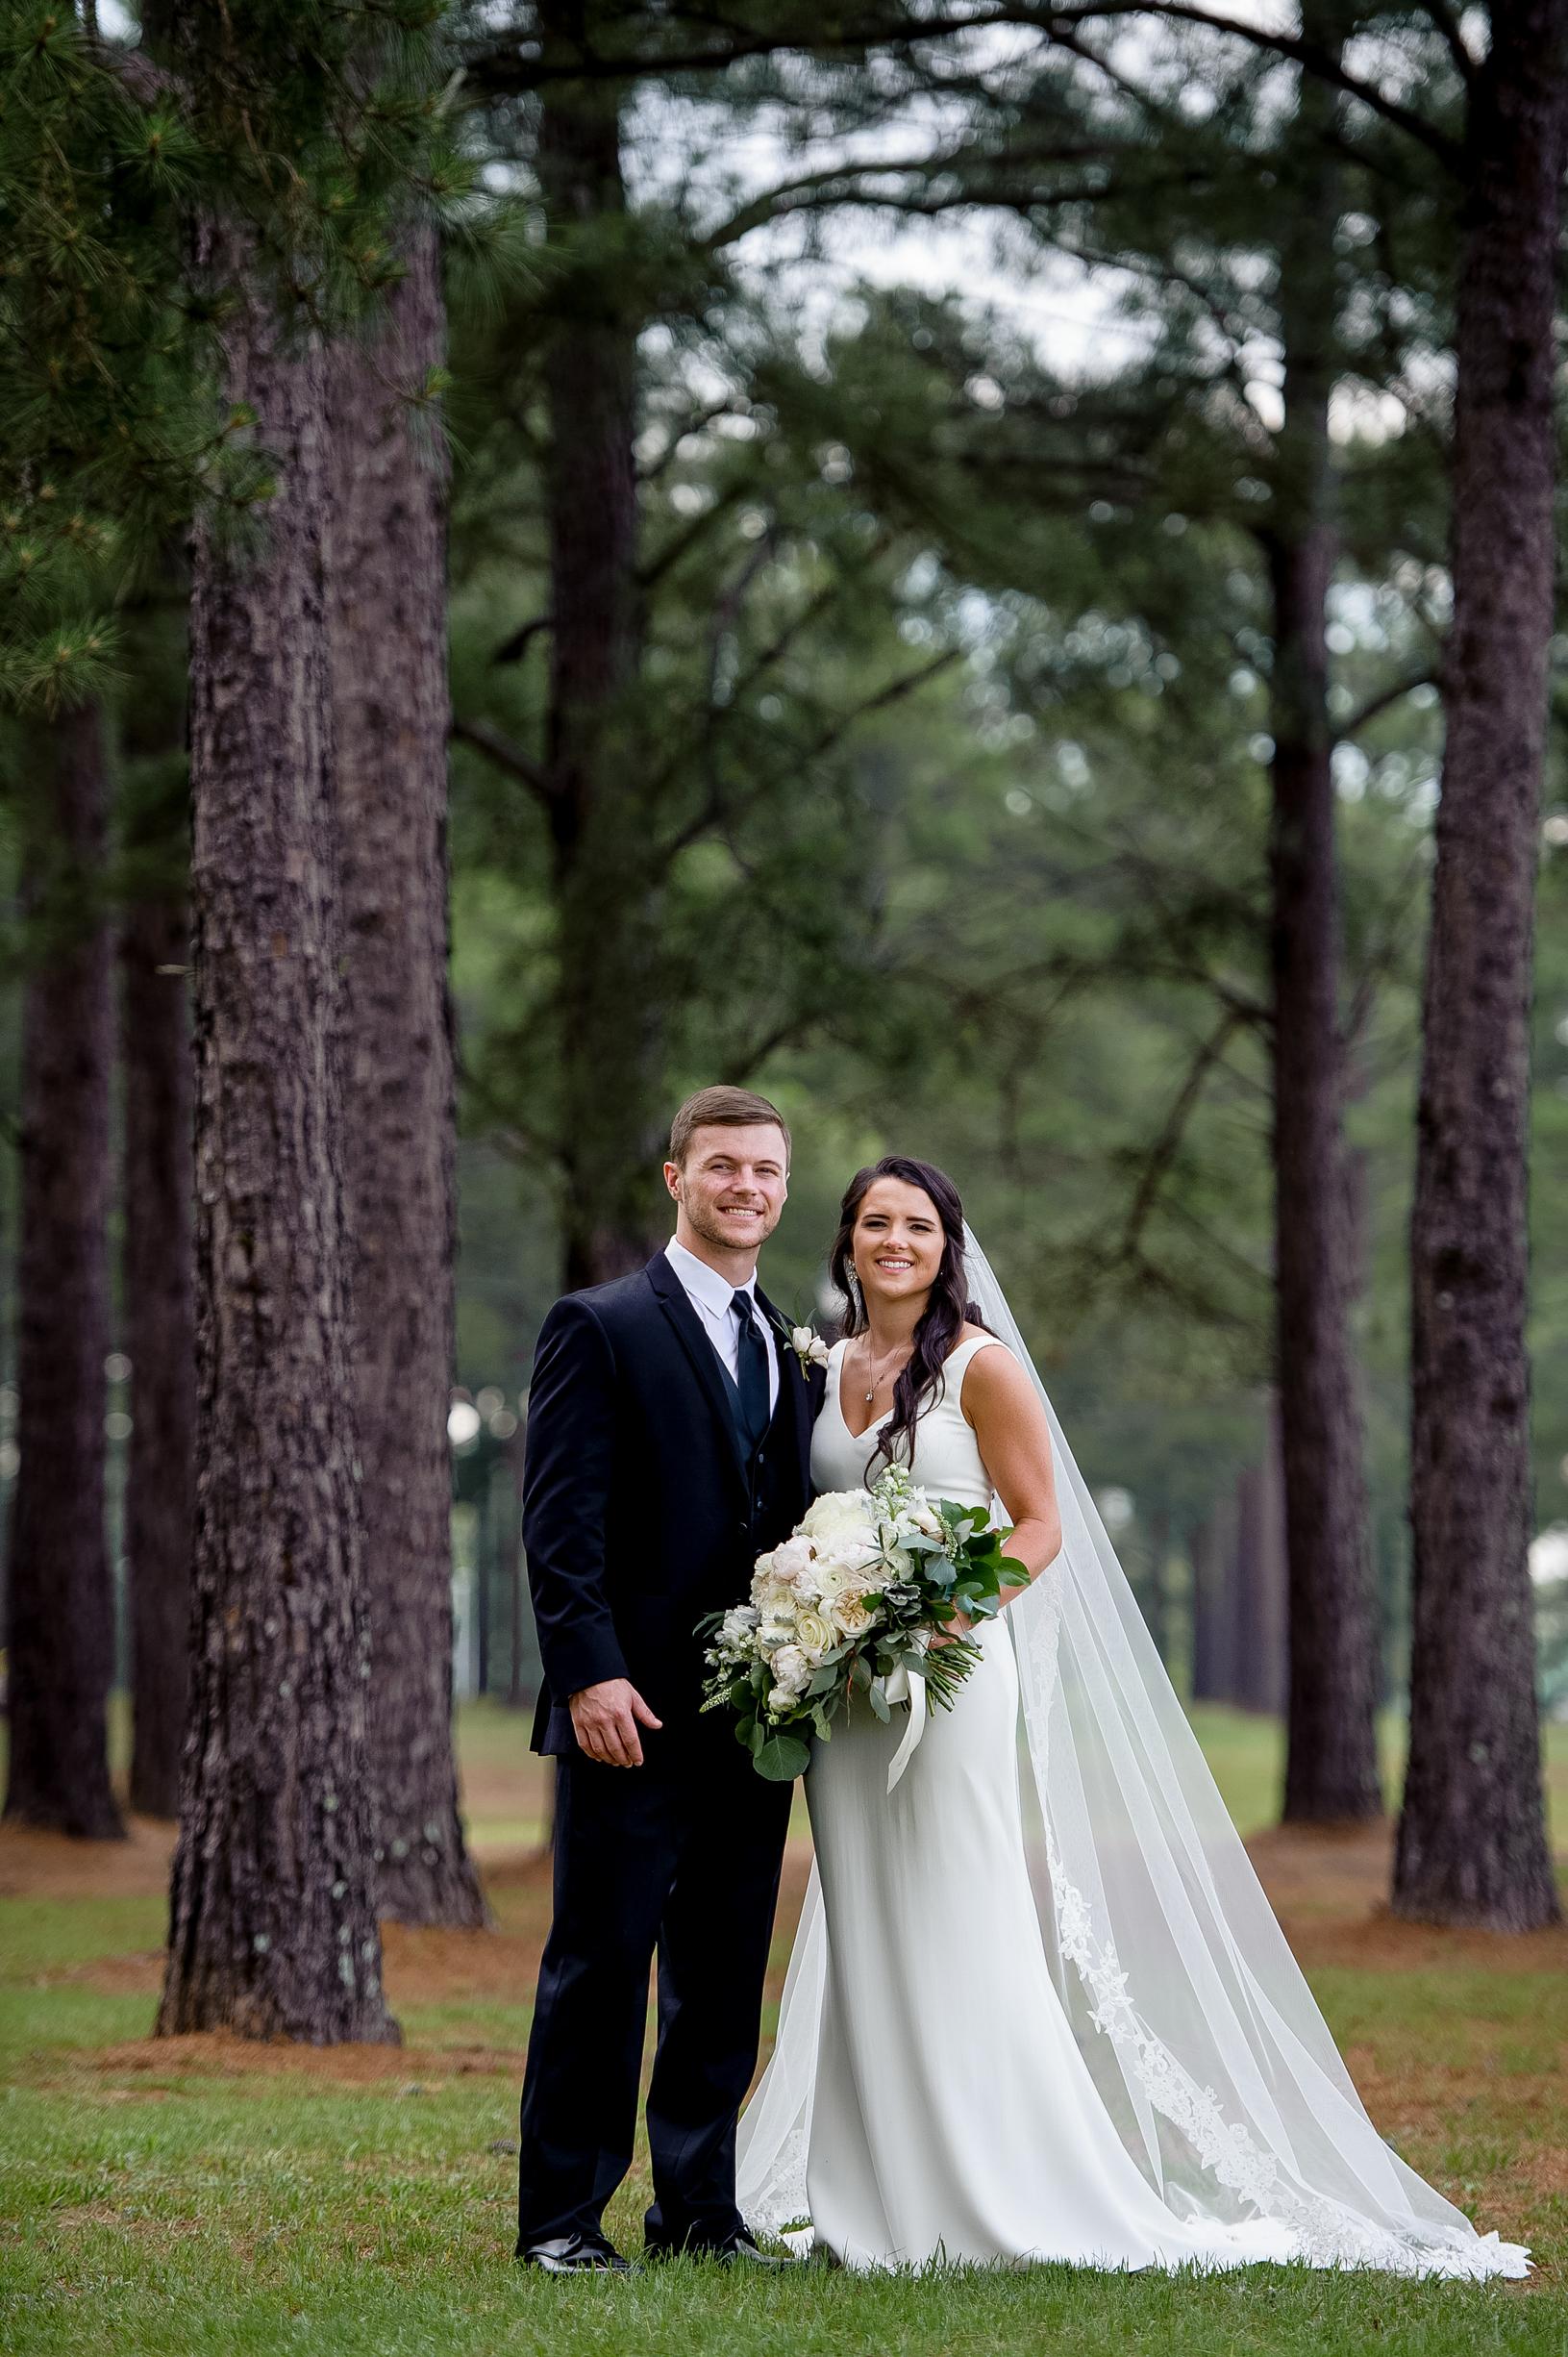 Royal Wedding with Outdoor Reception-25.JPG